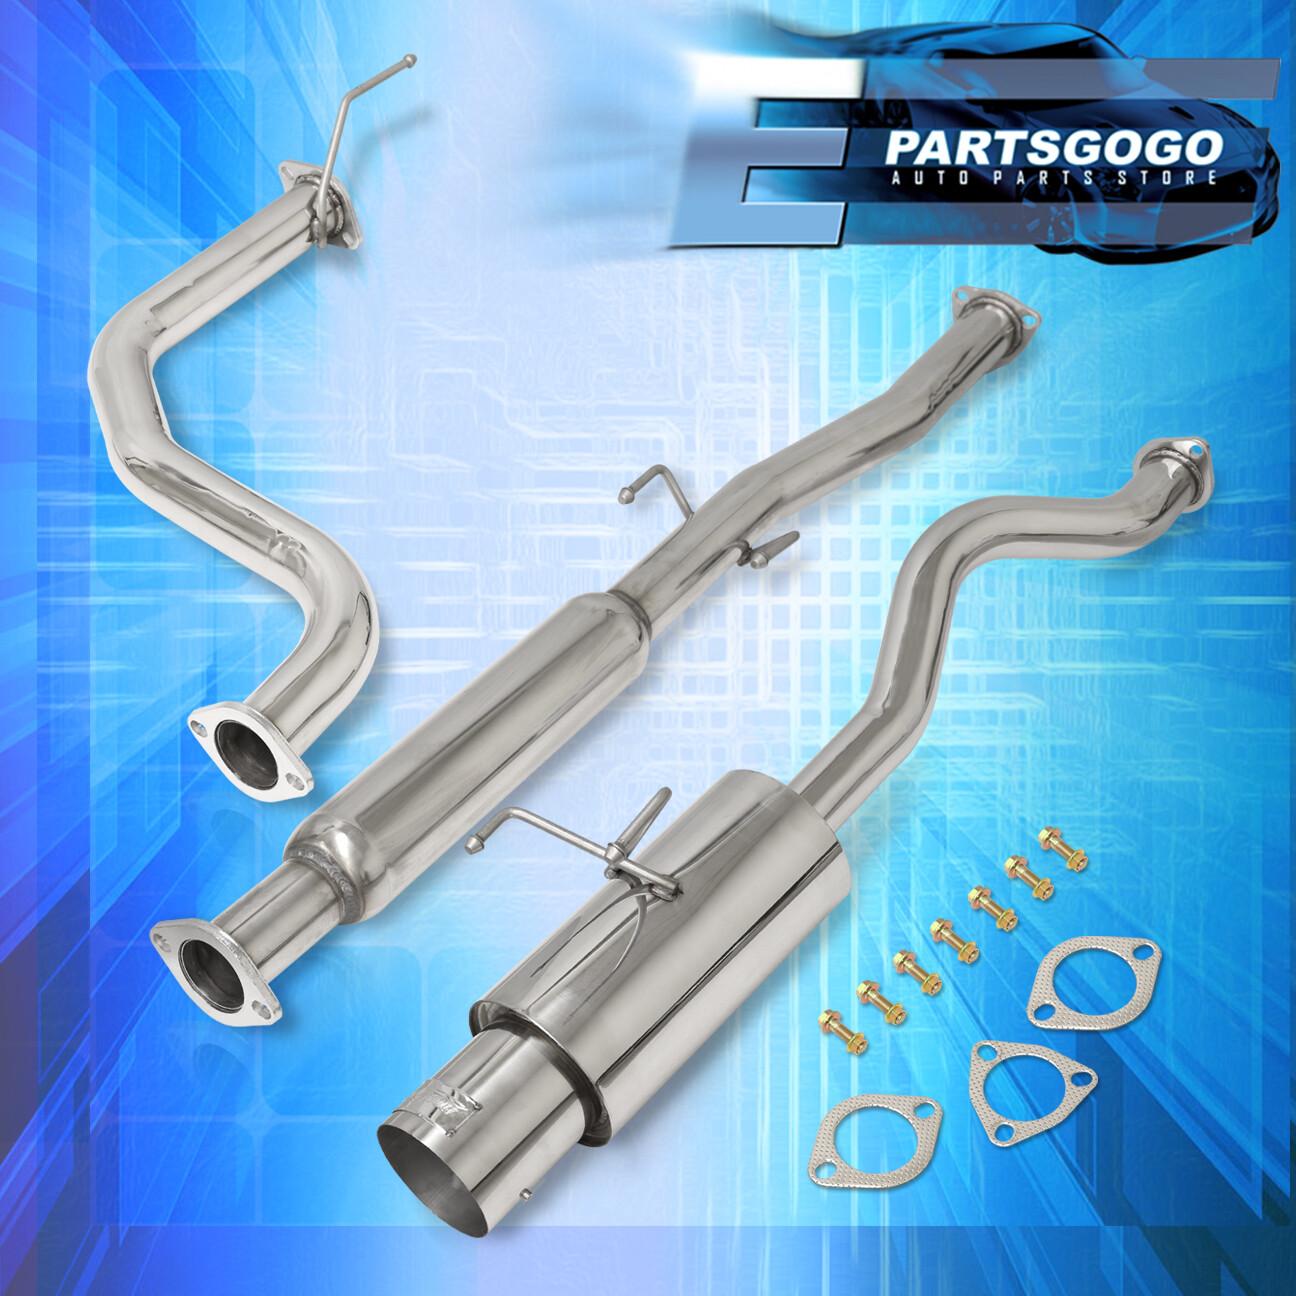 "Jdm Catback Exhaust 4.5/"" Muffler Burned N1 Tip For 94-01 Acura Integra Ls//Rs//Gs"